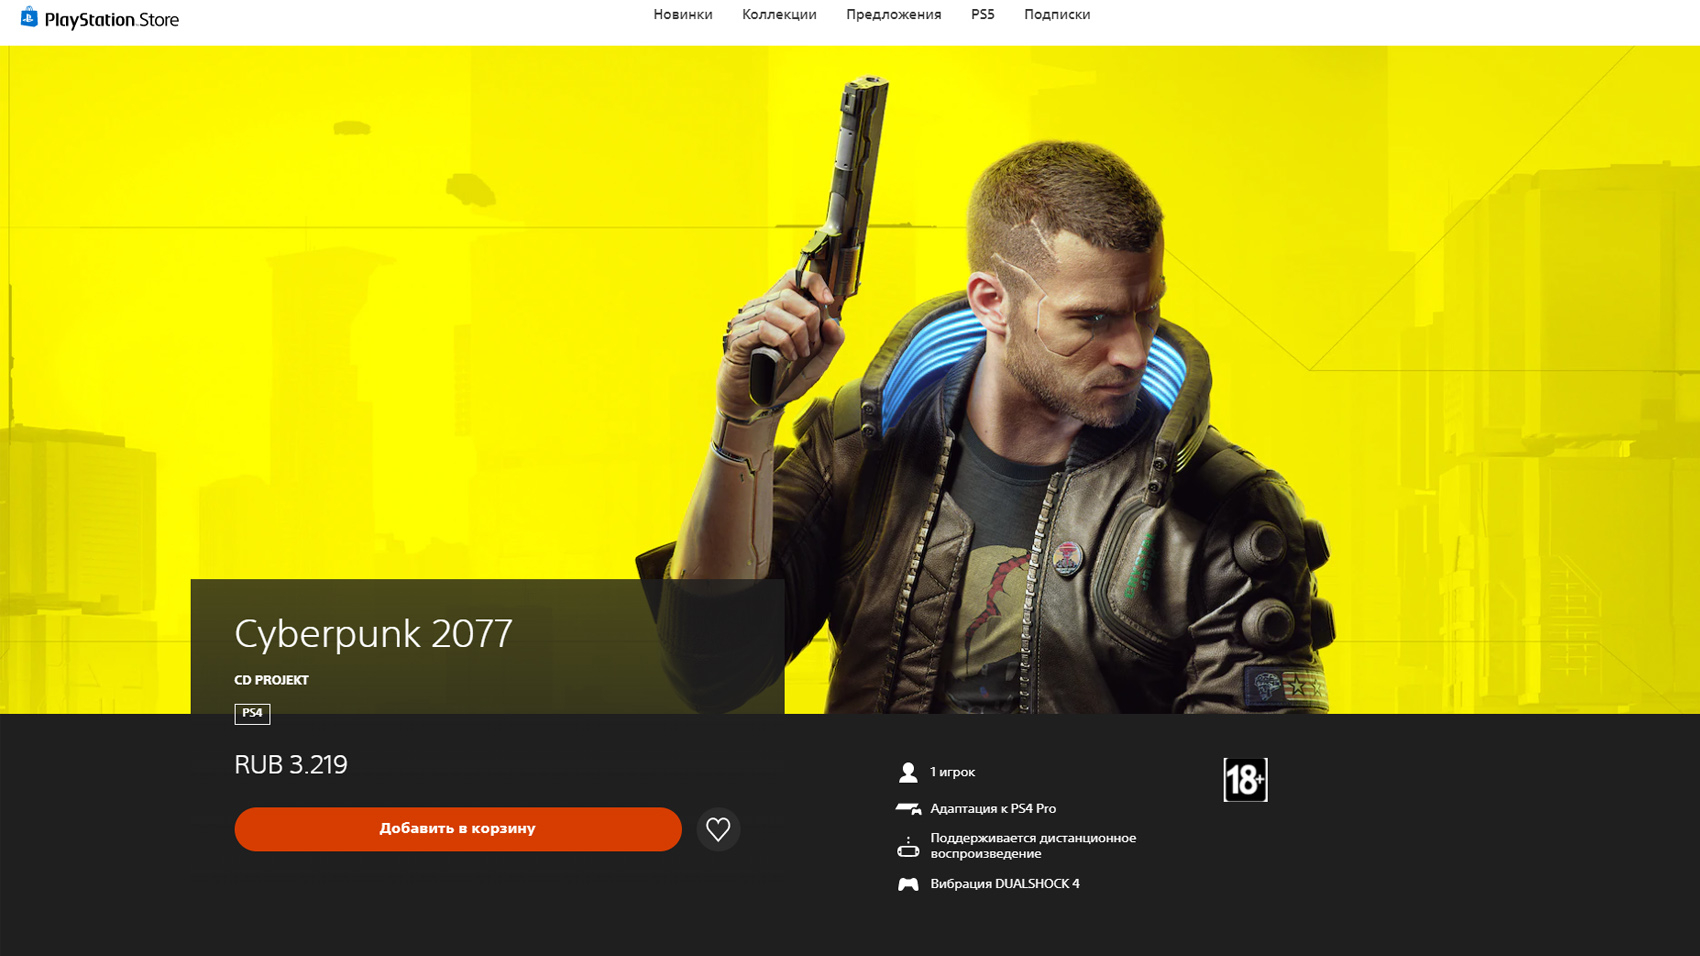 Sony вернула Cyberpunk 2077 в PS Store по сниженной цене